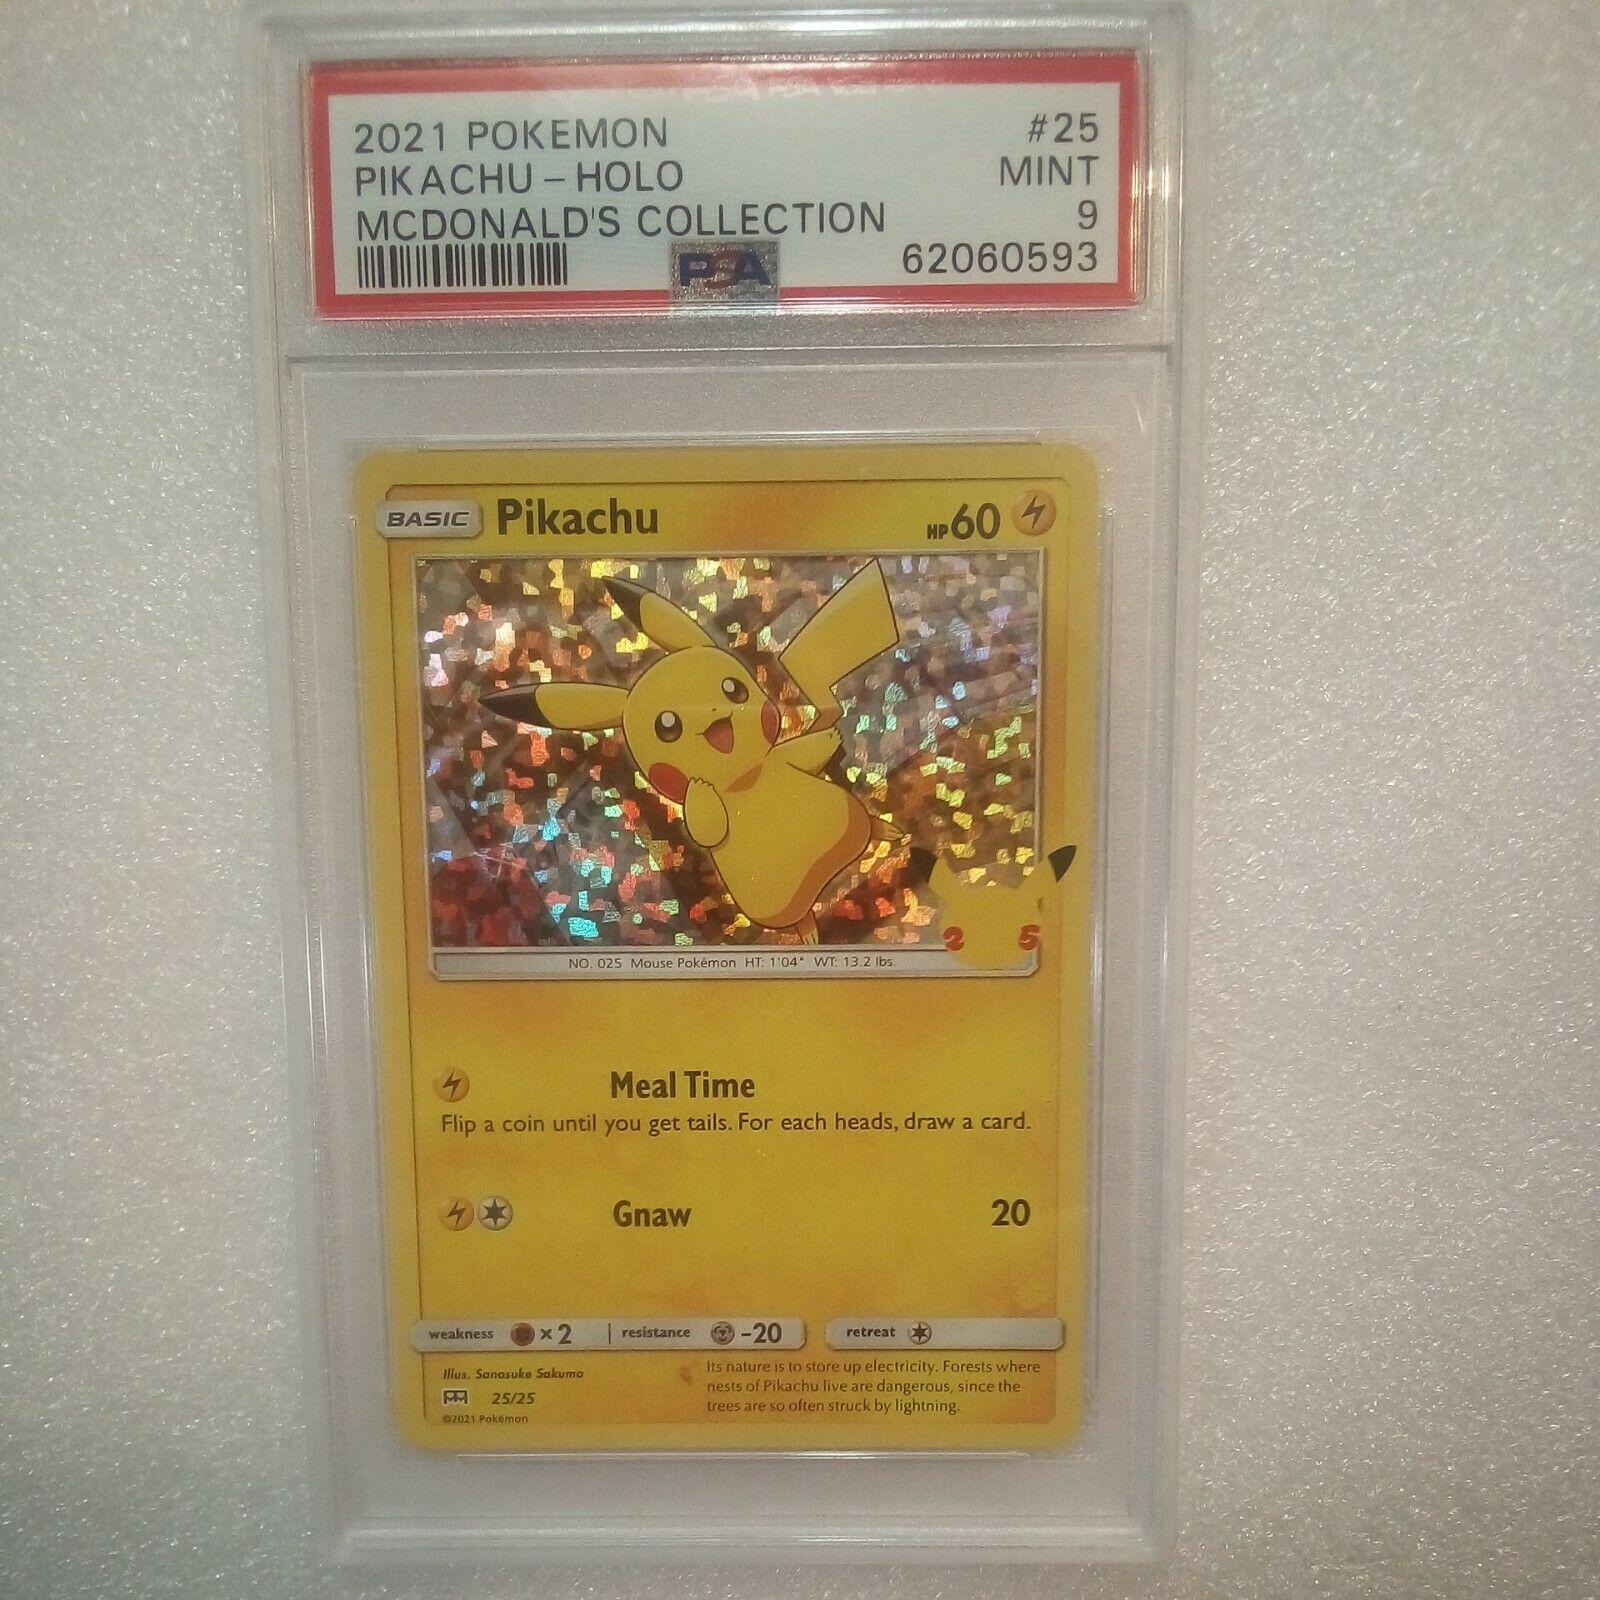 2021 Pokemon 25 McDonald's Collection 25/25 PIKACHU HOLO #25 PSA 9 MINT